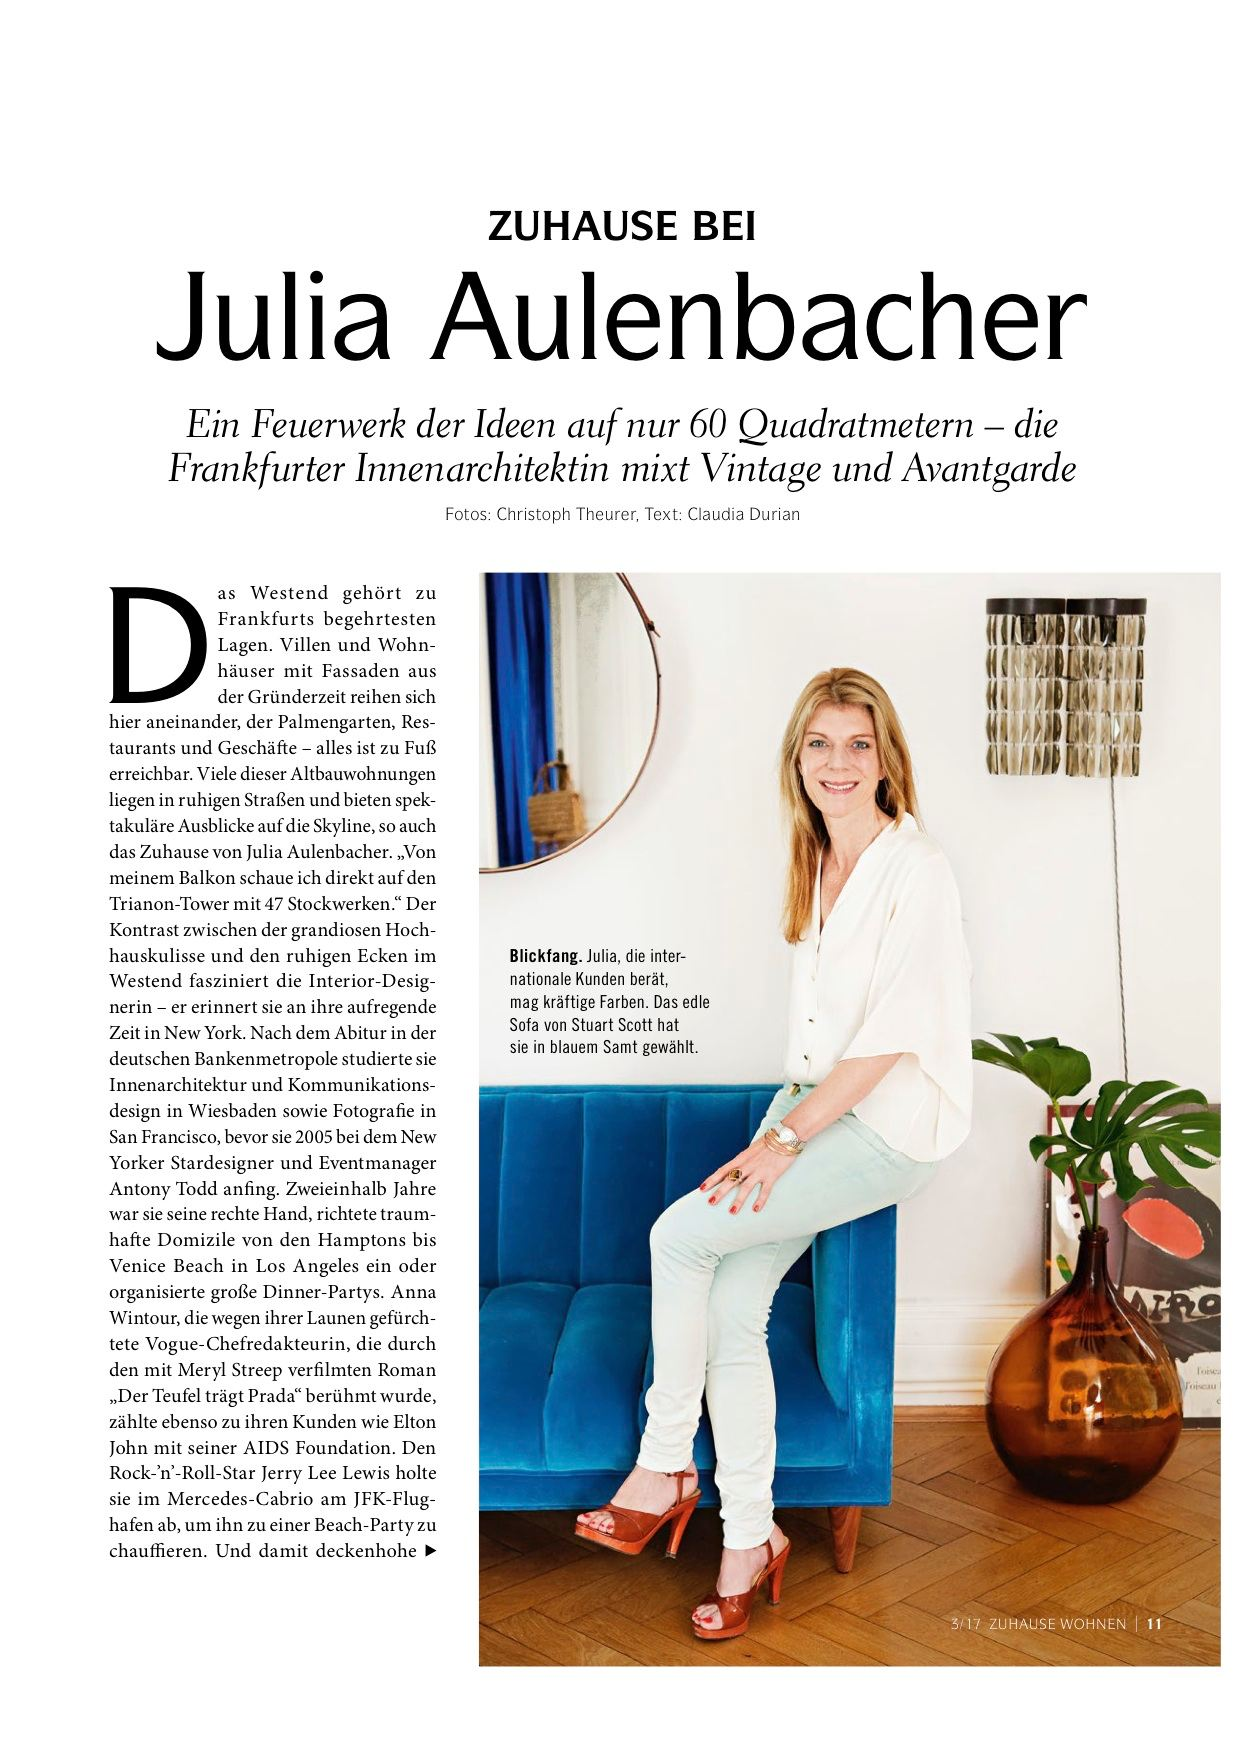 Julia Aulenbacher - Interiors +++ zu Hause wohnen 1